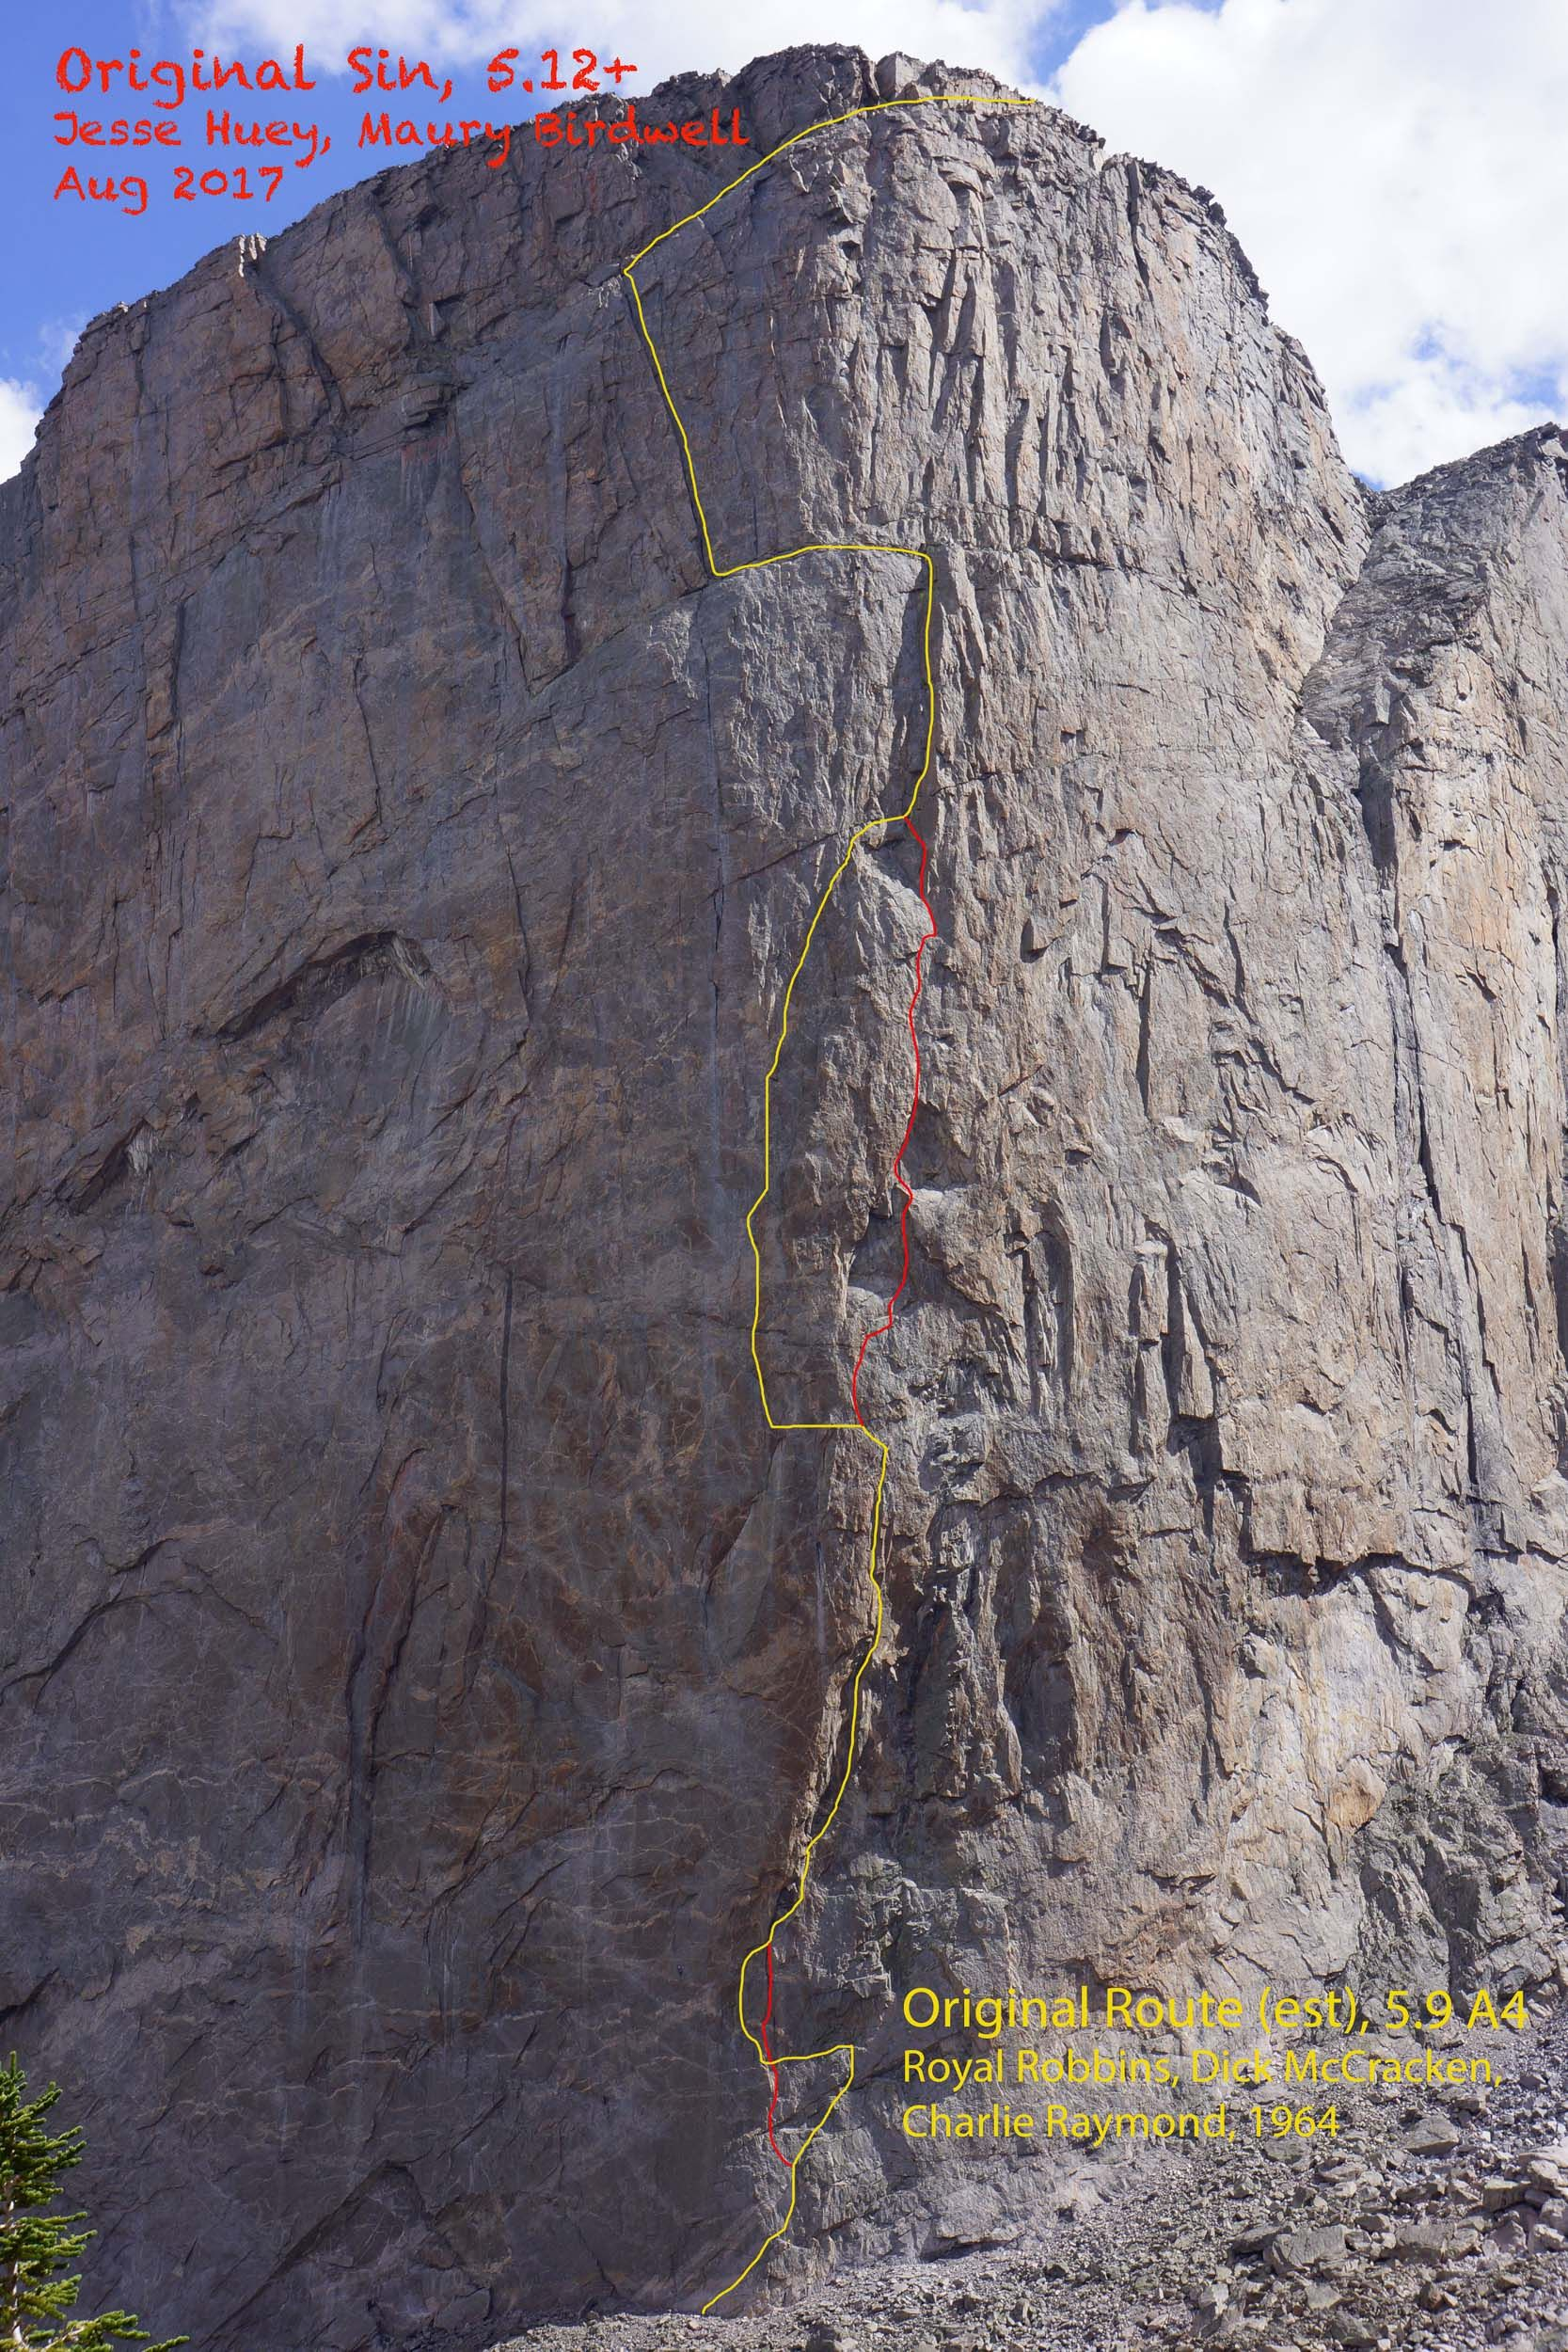 Committed Original Sin Climb Rock Climbing Climbers